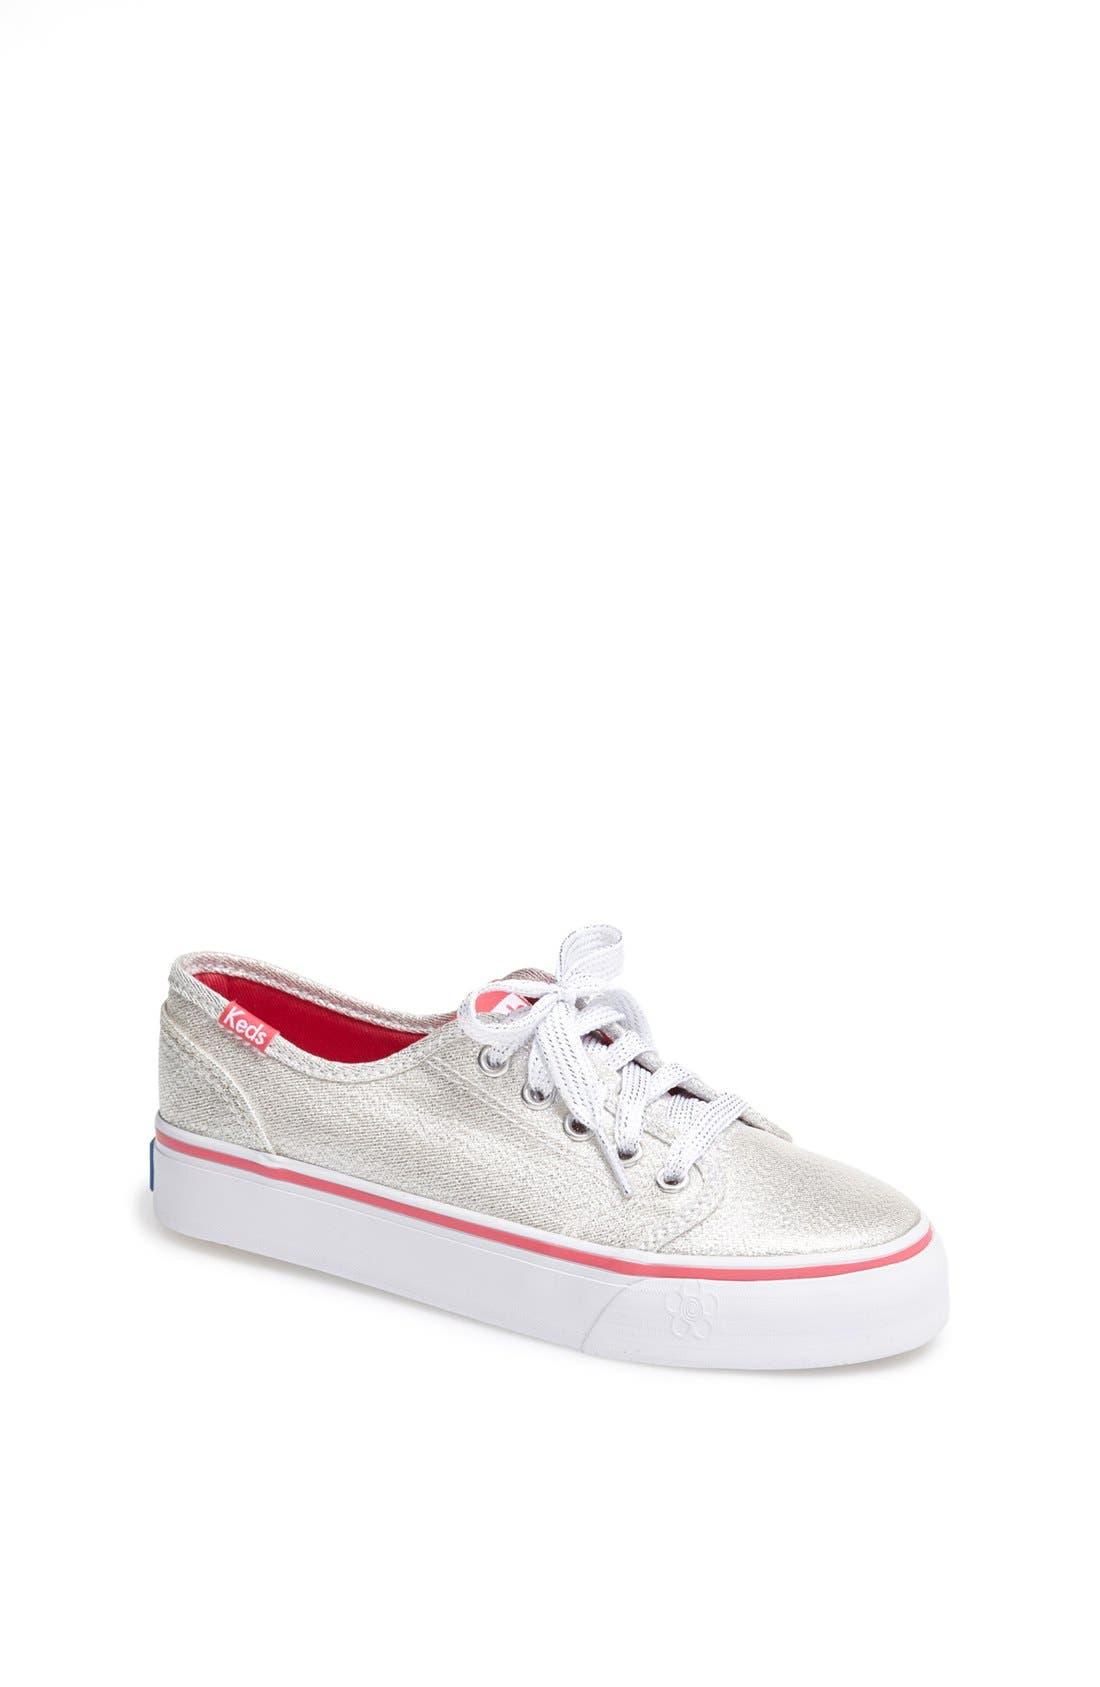 Alternate Image 1 Selected - Keds® 'Double Dutch Shimmer' Sneaker (Toddler, Little Kid & Big Kid)